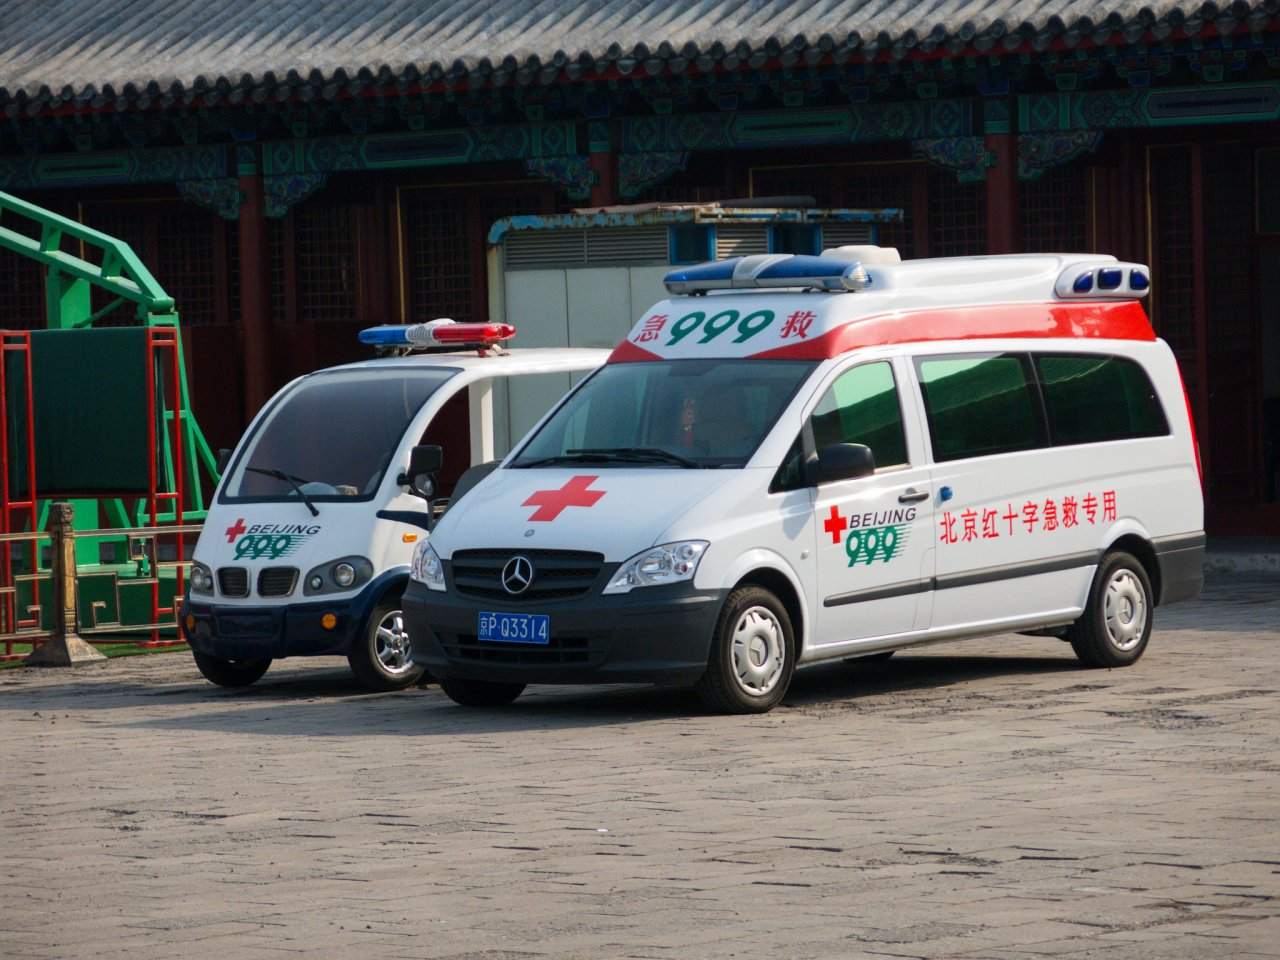 ambulance-beijing-charges